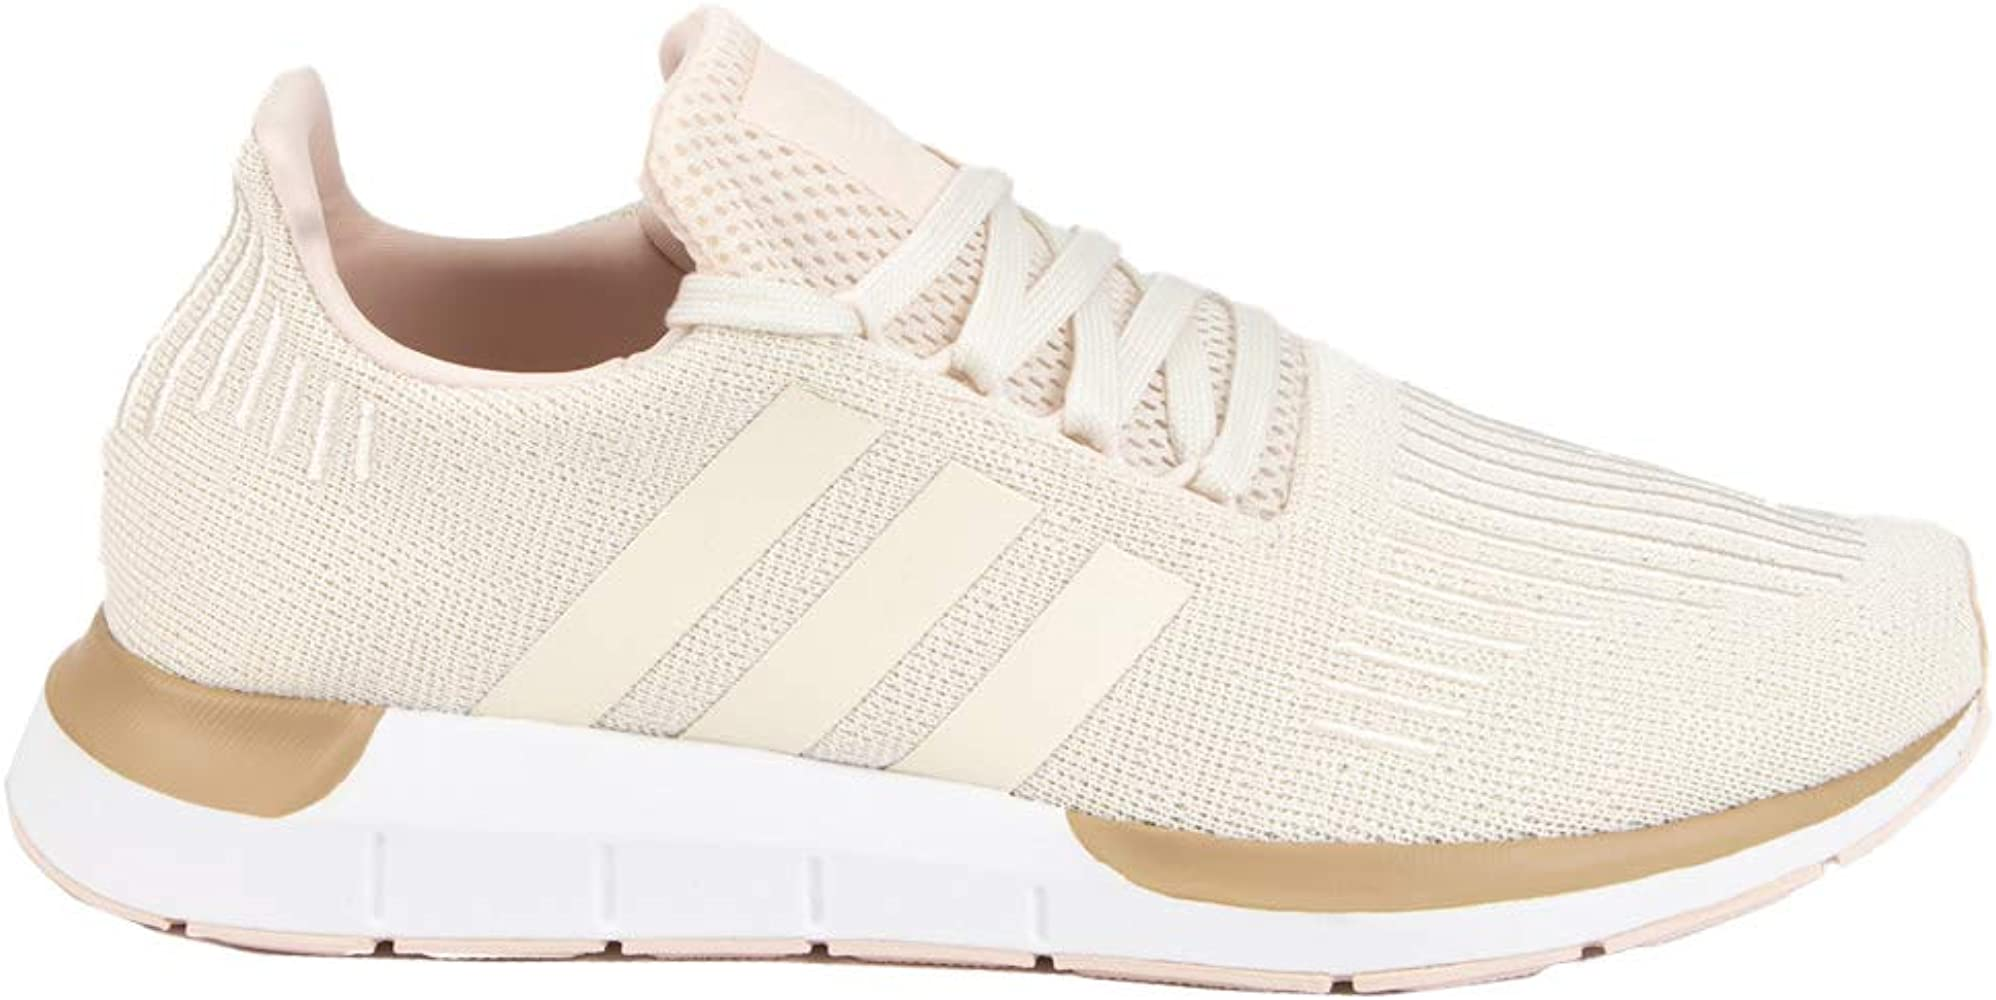 adidas Swift Run Cloud White Shoes